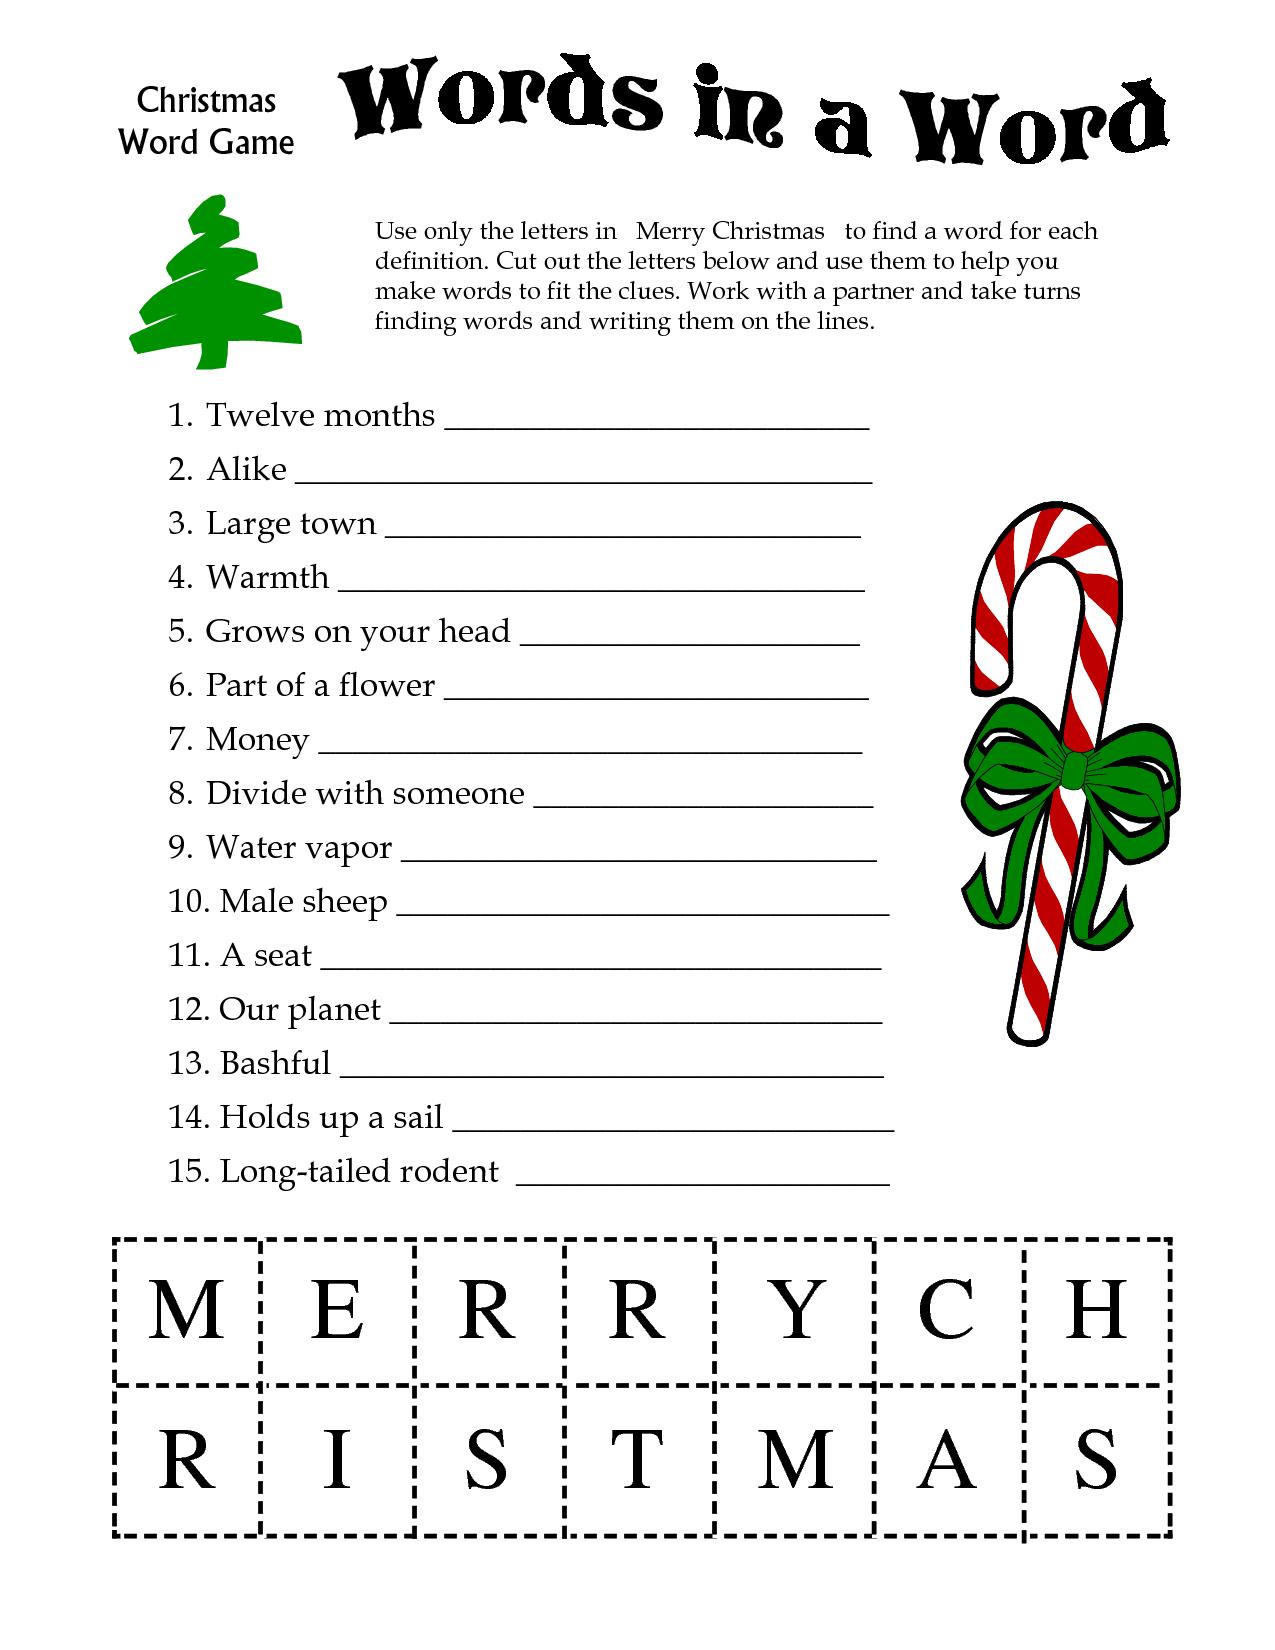 Free Printable Christmas Word Games Puzzles – Festival Collections - Christmas Printable Puzzles Games